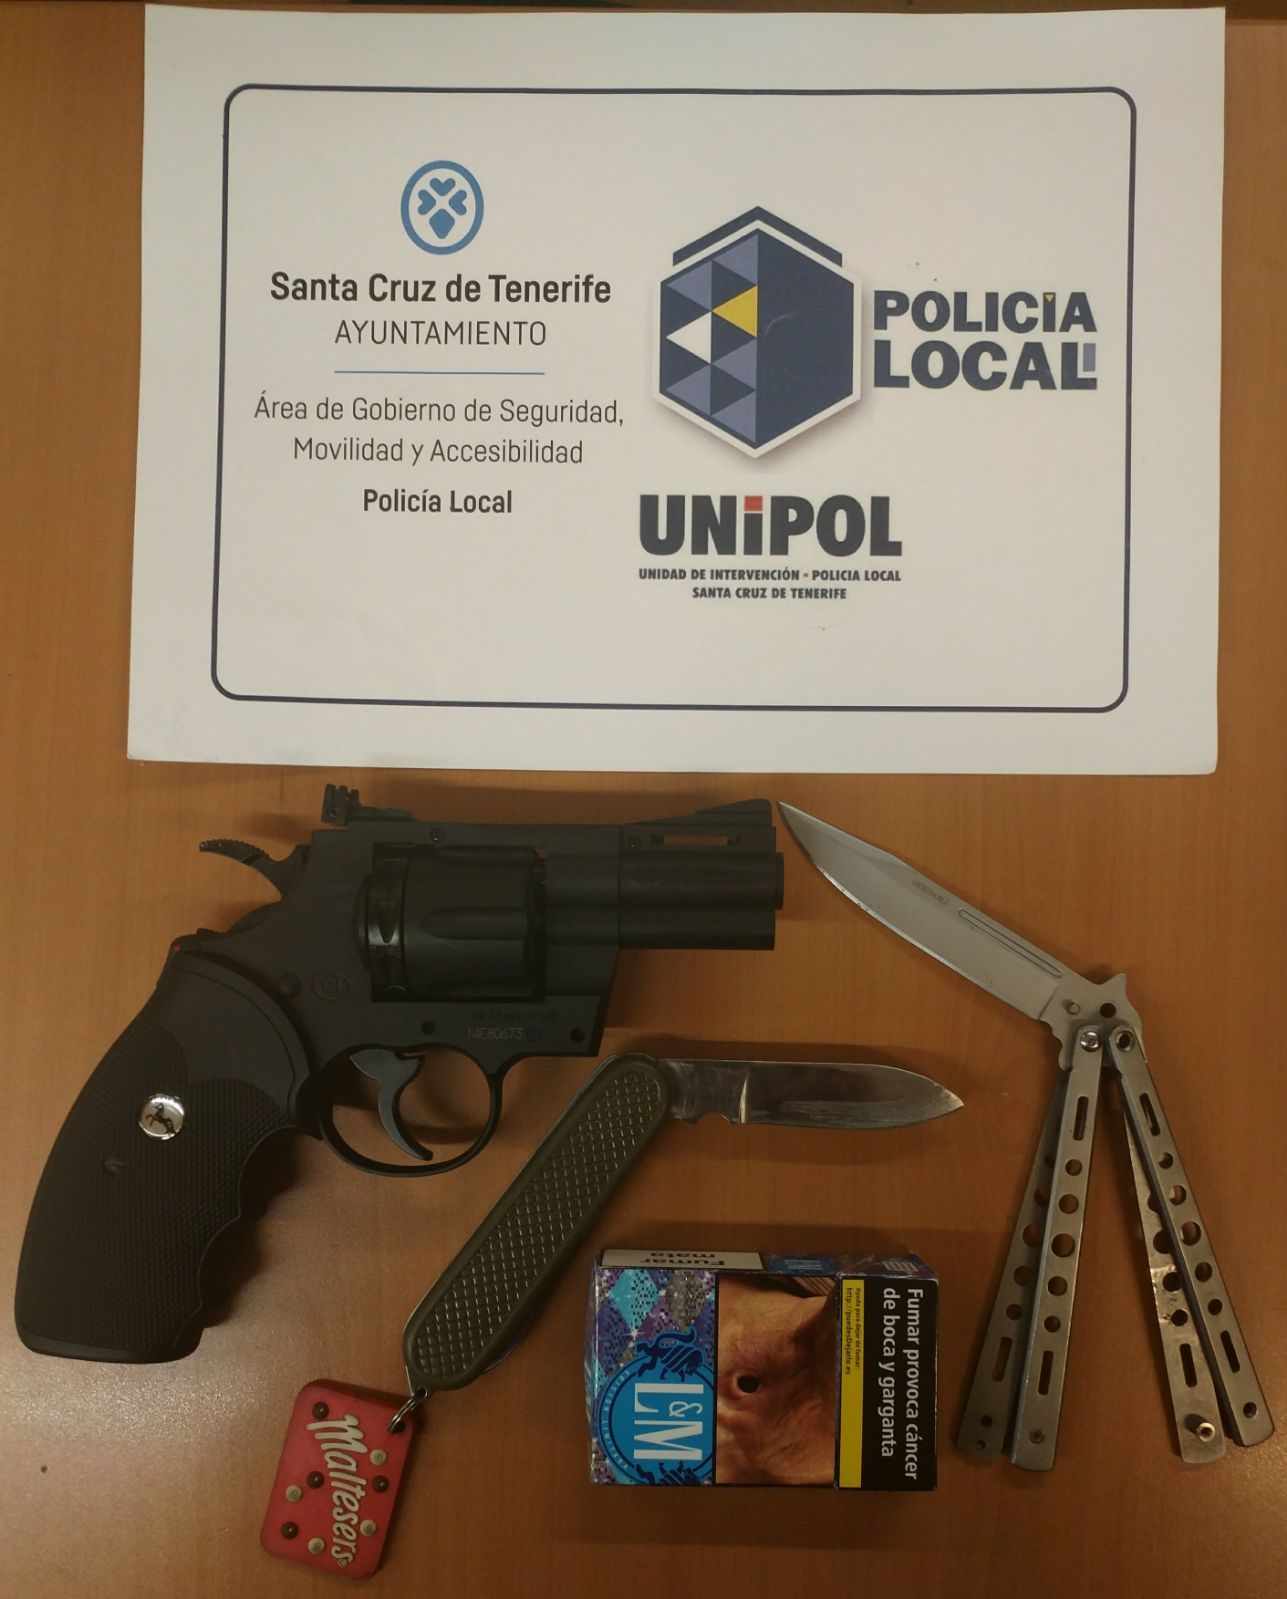 Foto del arma simulada | TWITTER (Policía Local)